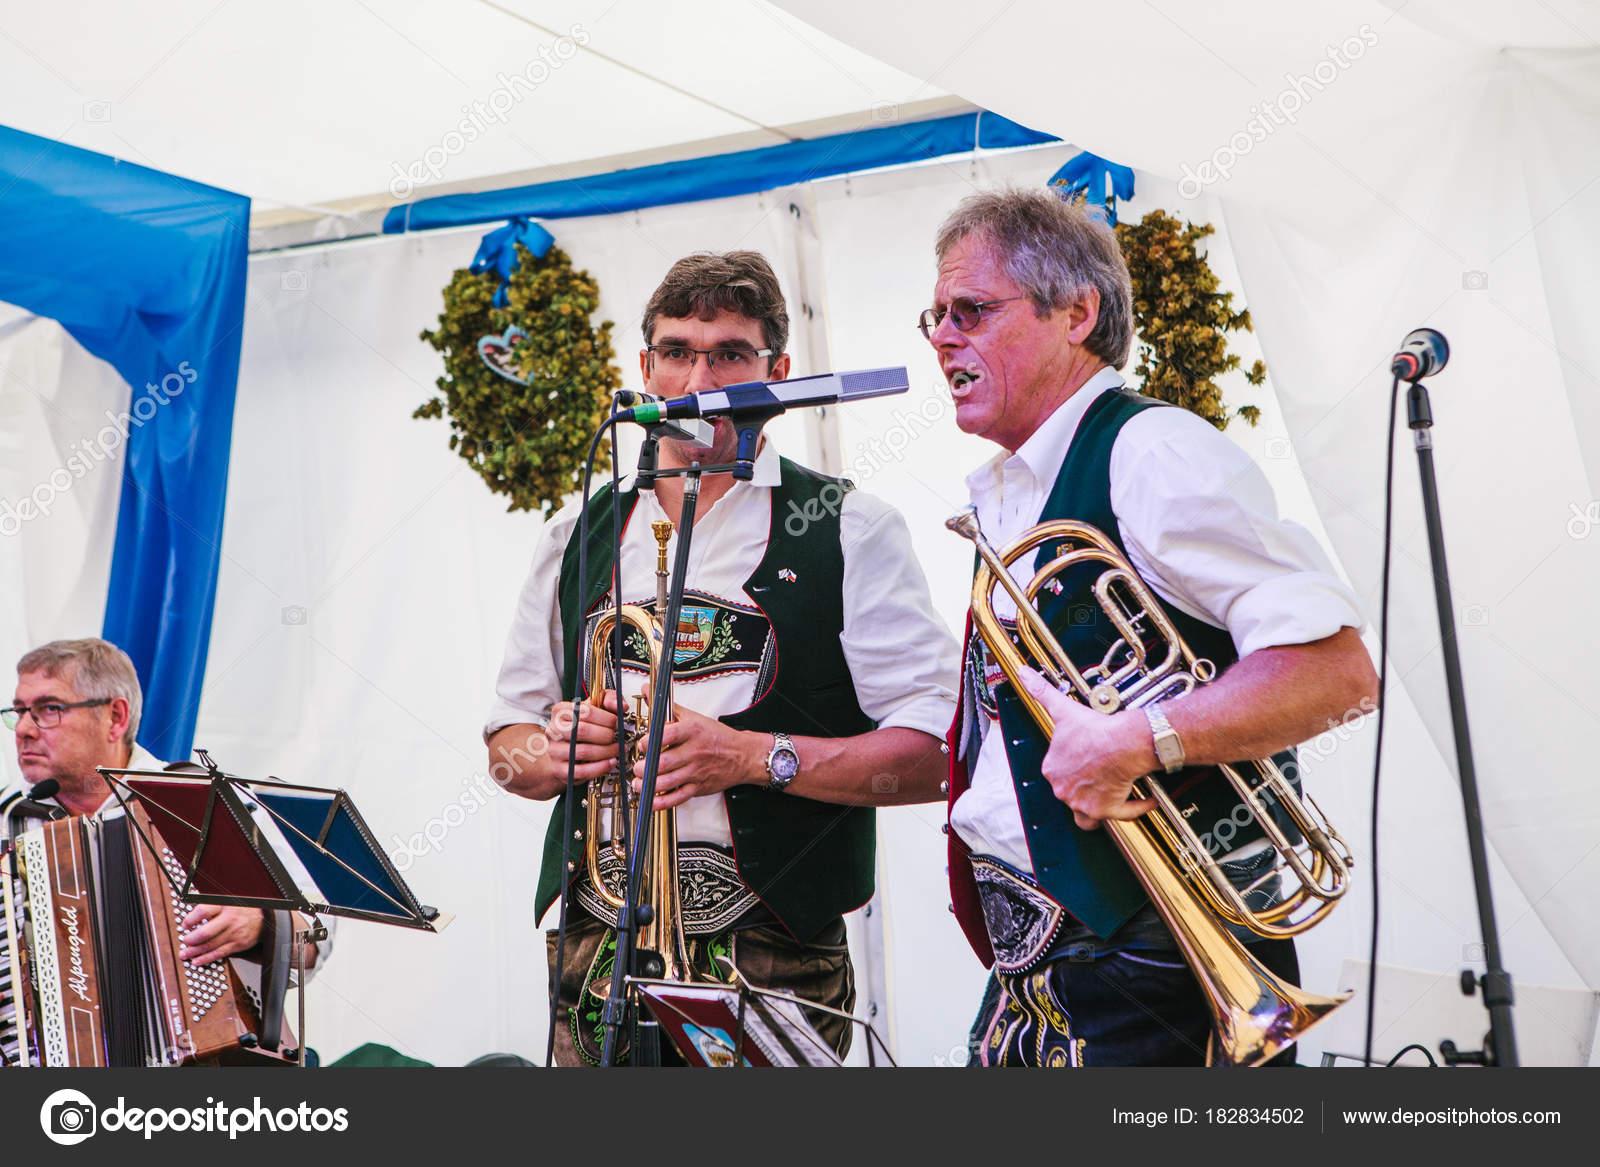 Prague, September 23, 2017: Celebrating the traditional